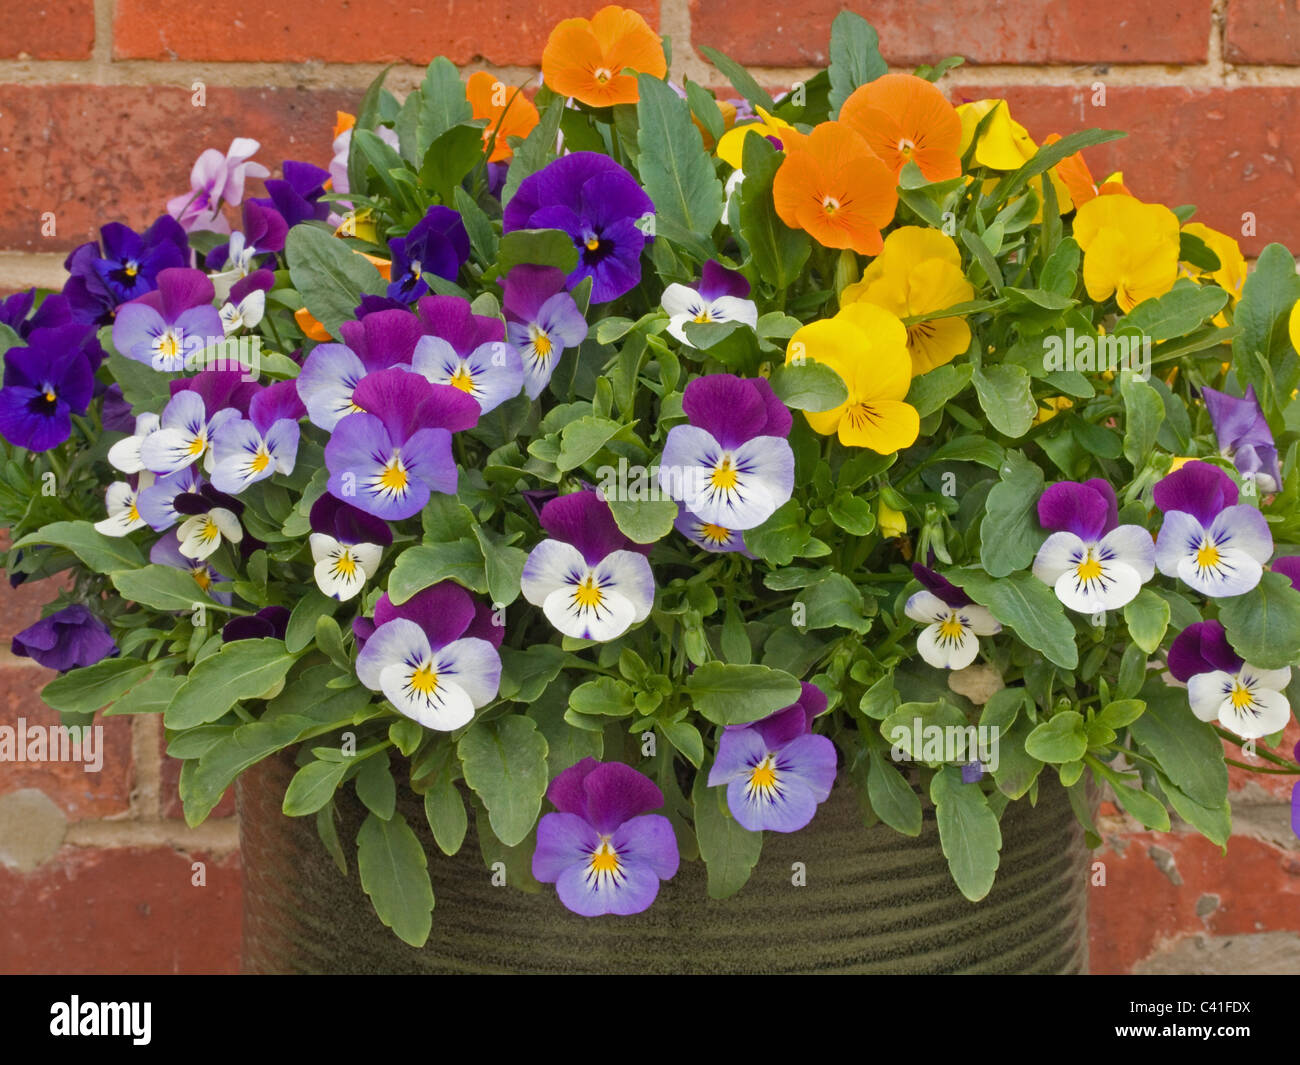 viola flower plant - Stock Image